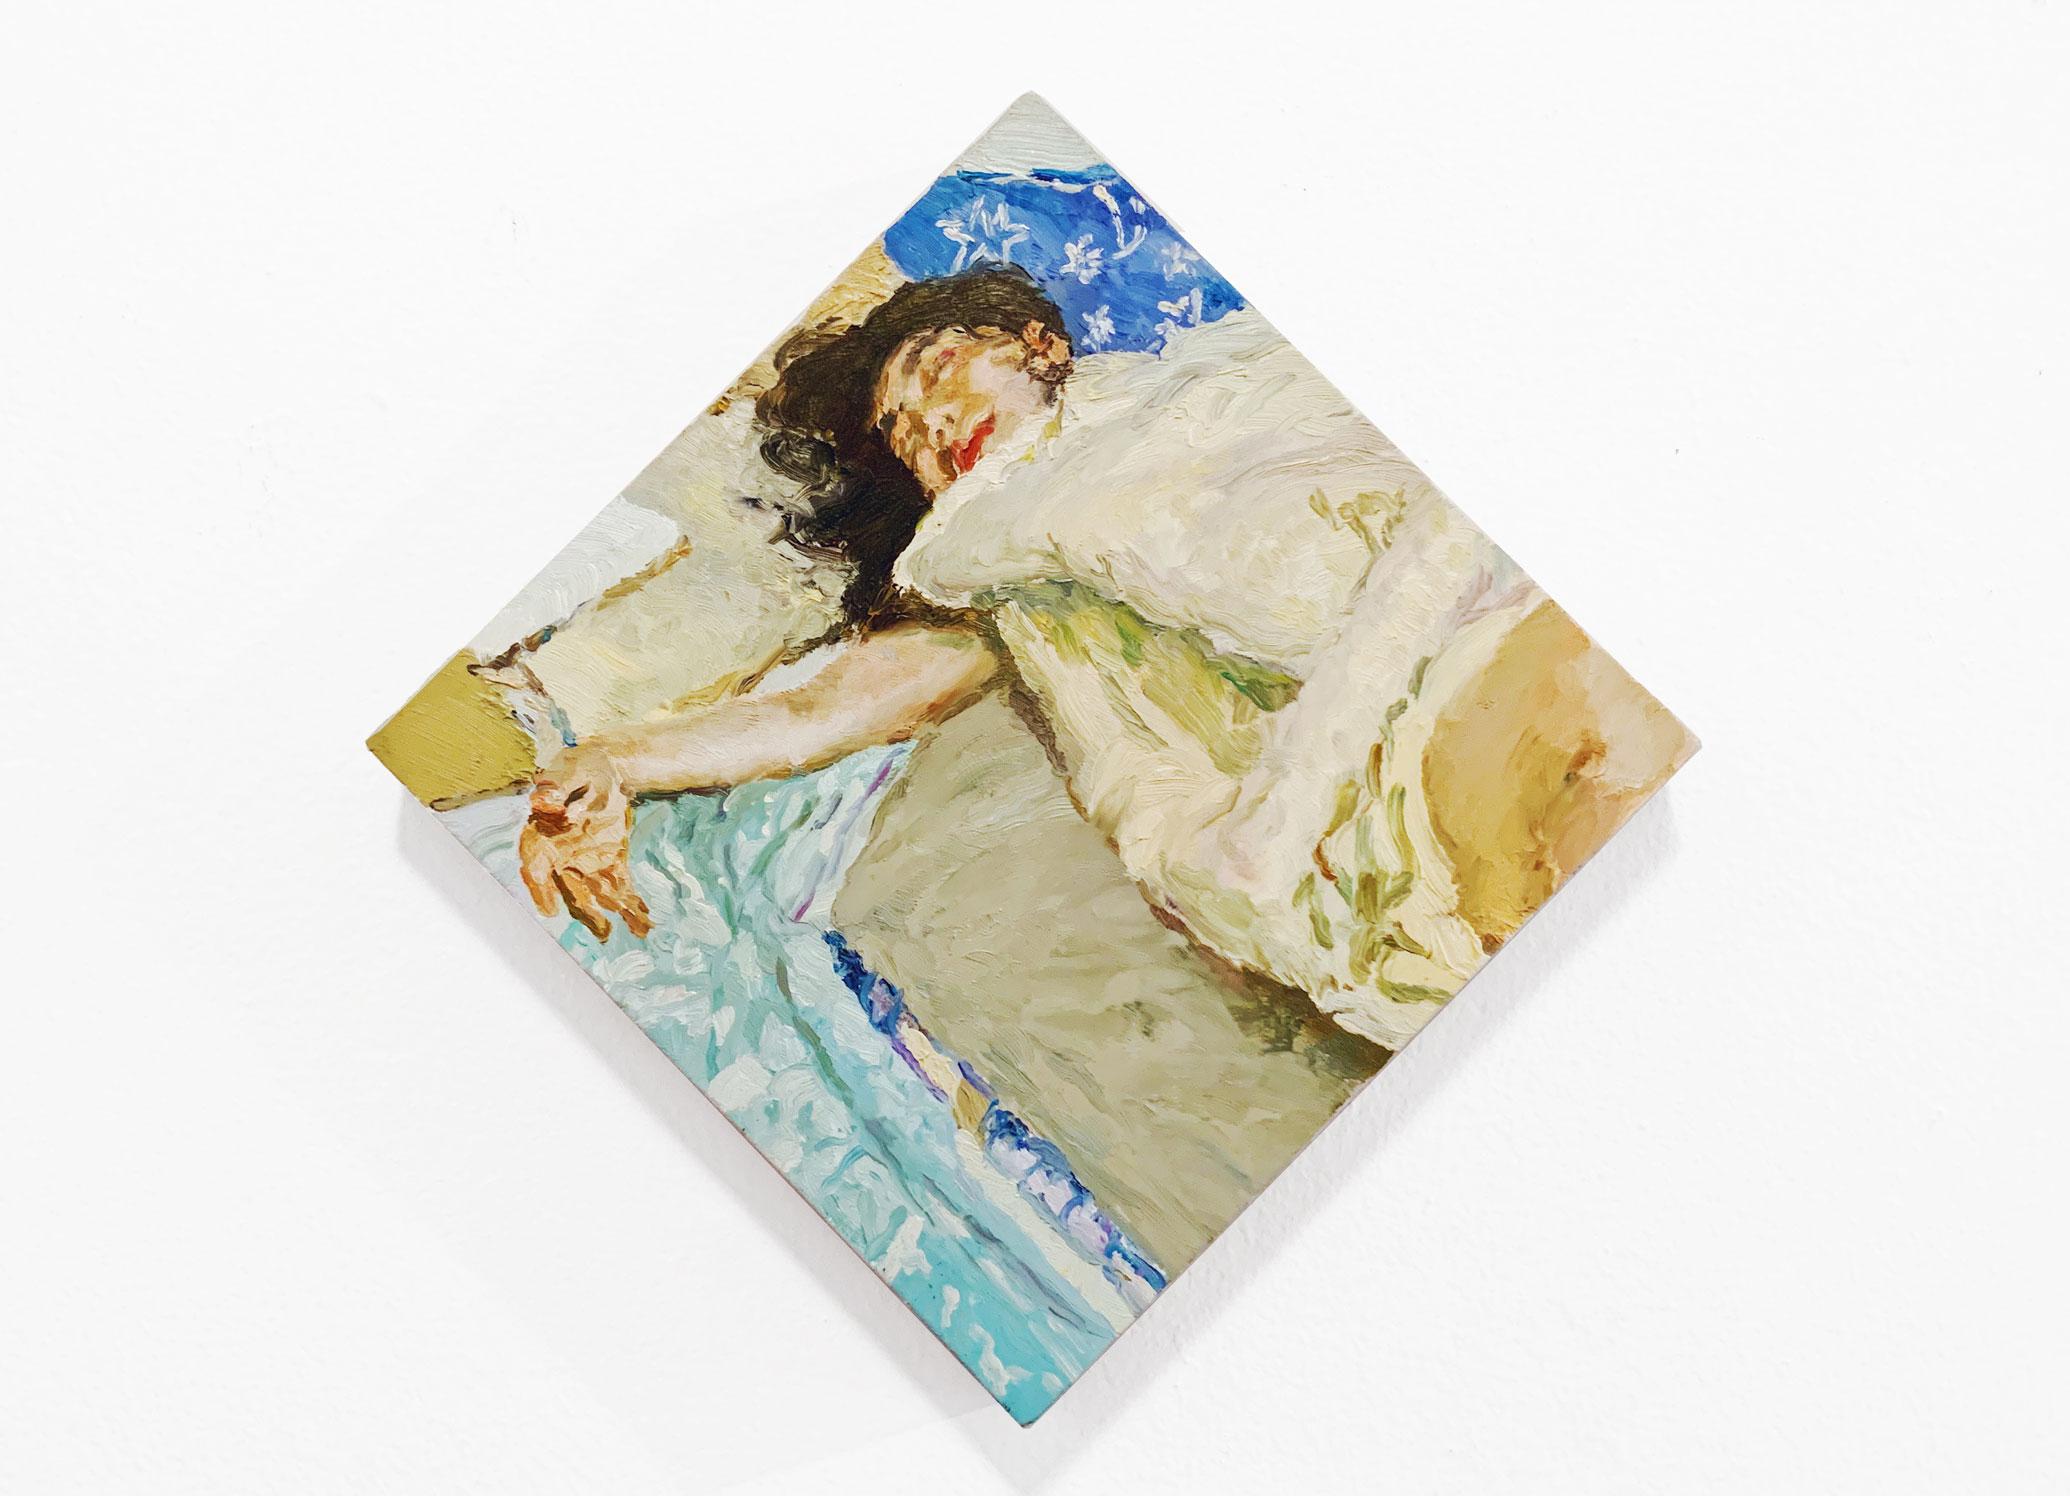 Chi Ming/Sleeping Beauty, 2014